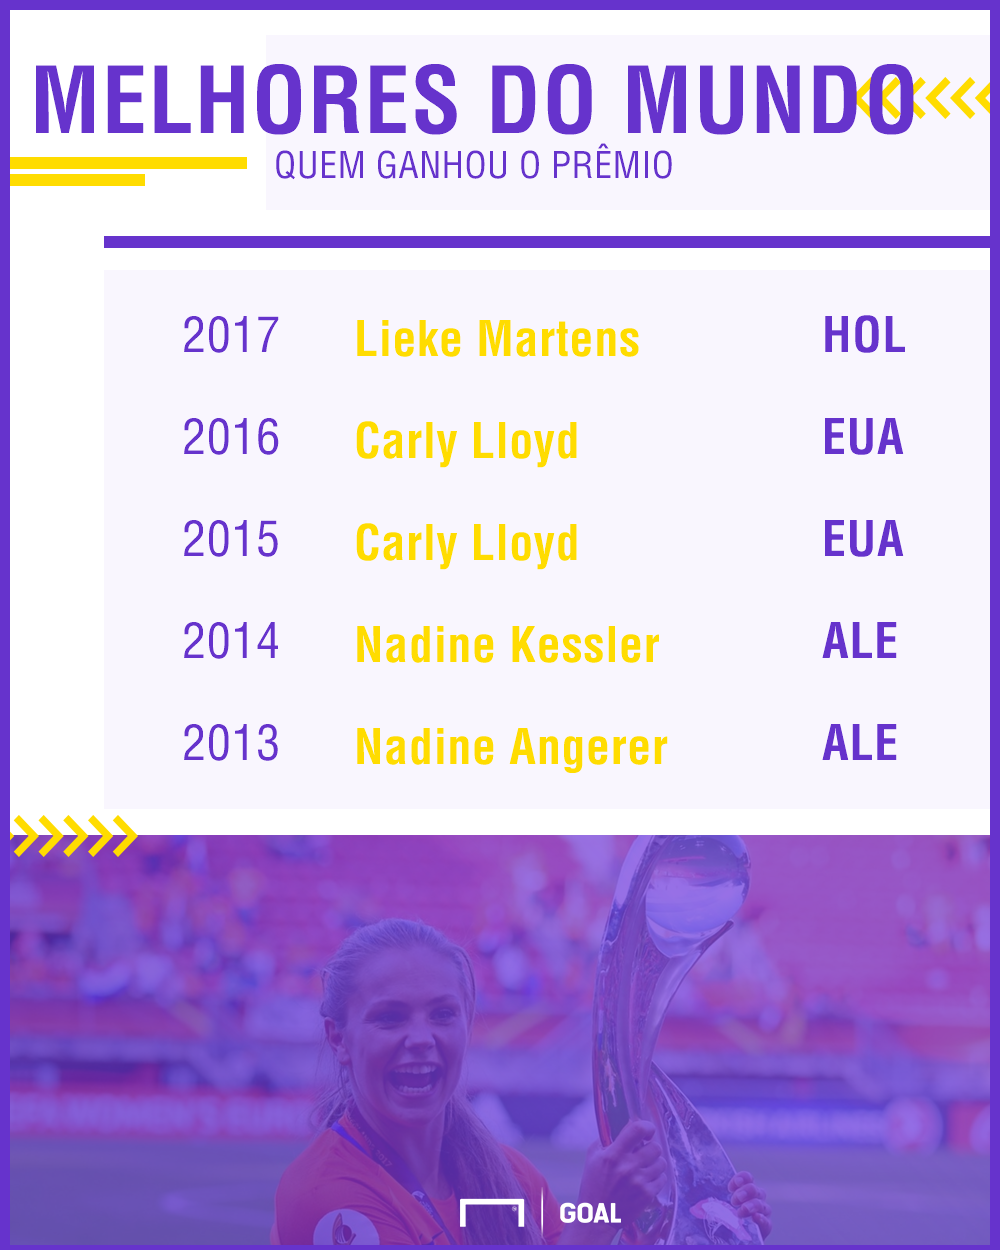 GFX Jogadoras Premio Fifa I 08 03 2017